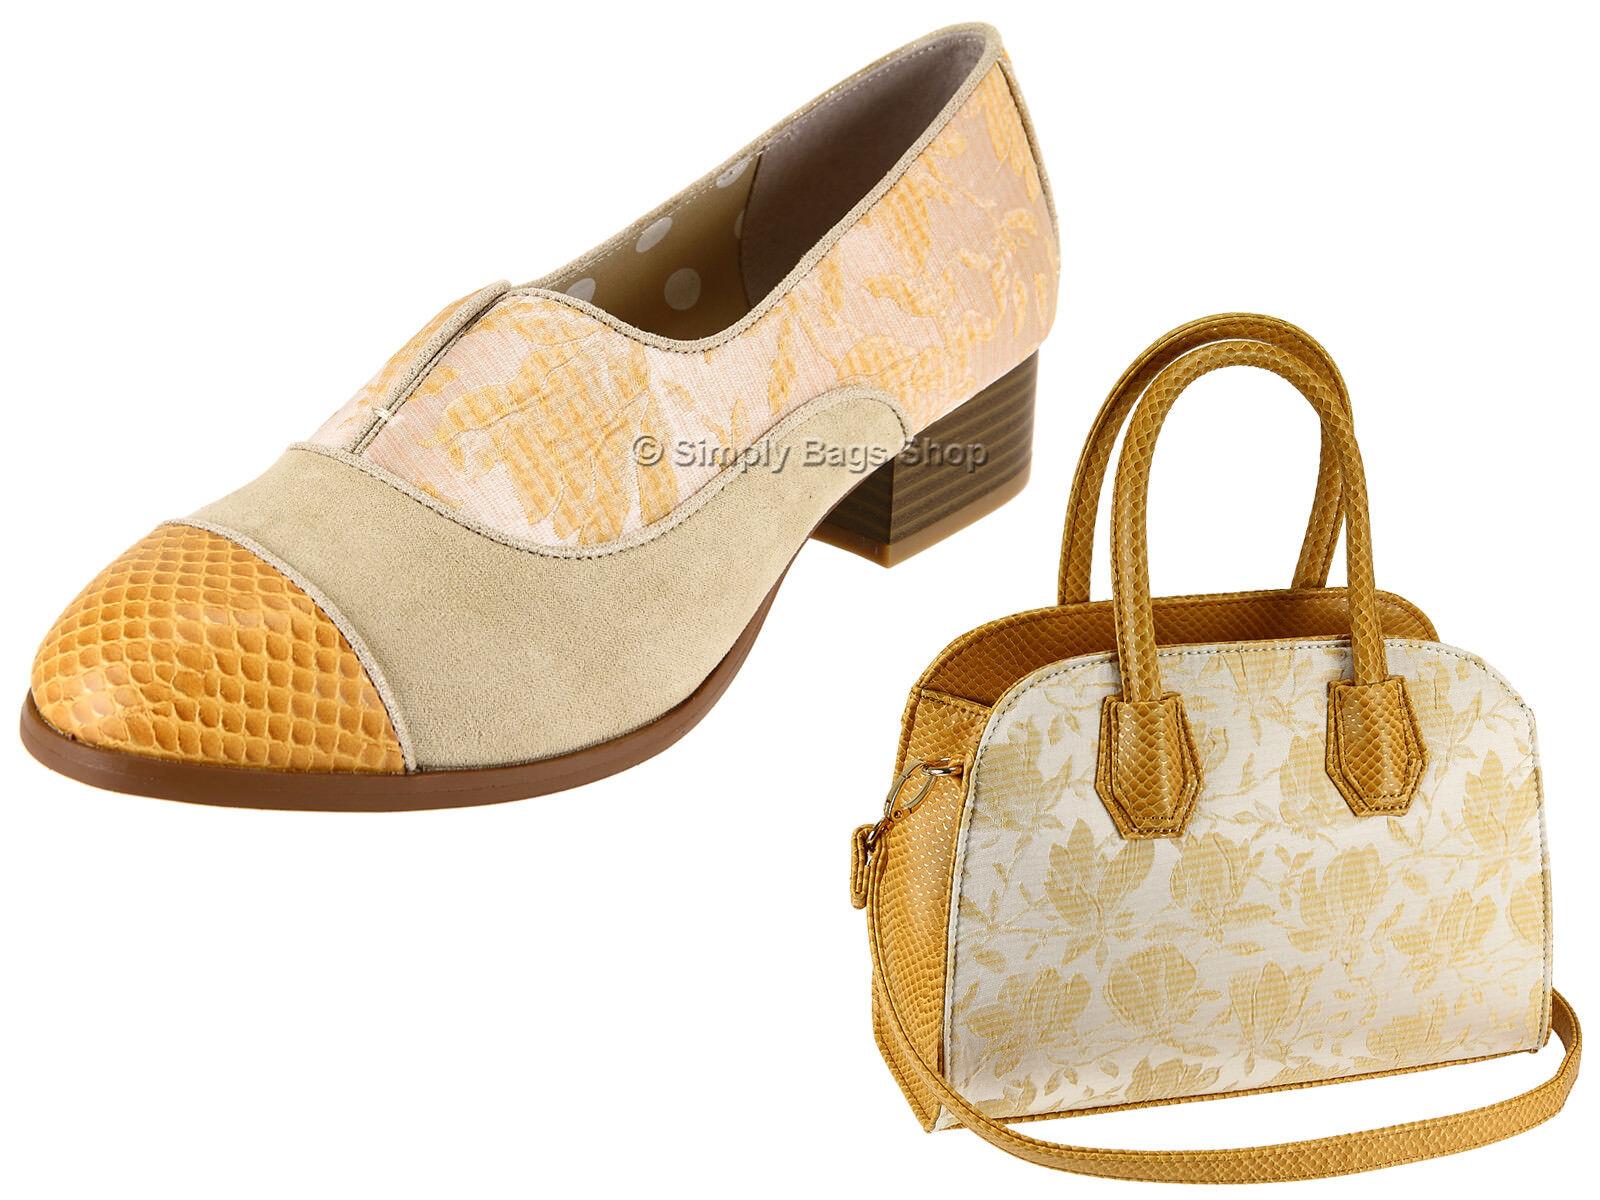 Ruby Shoo Ladies Vegan Low Heel Slip On Loafer Shoes - Add Matching Bag Cancun